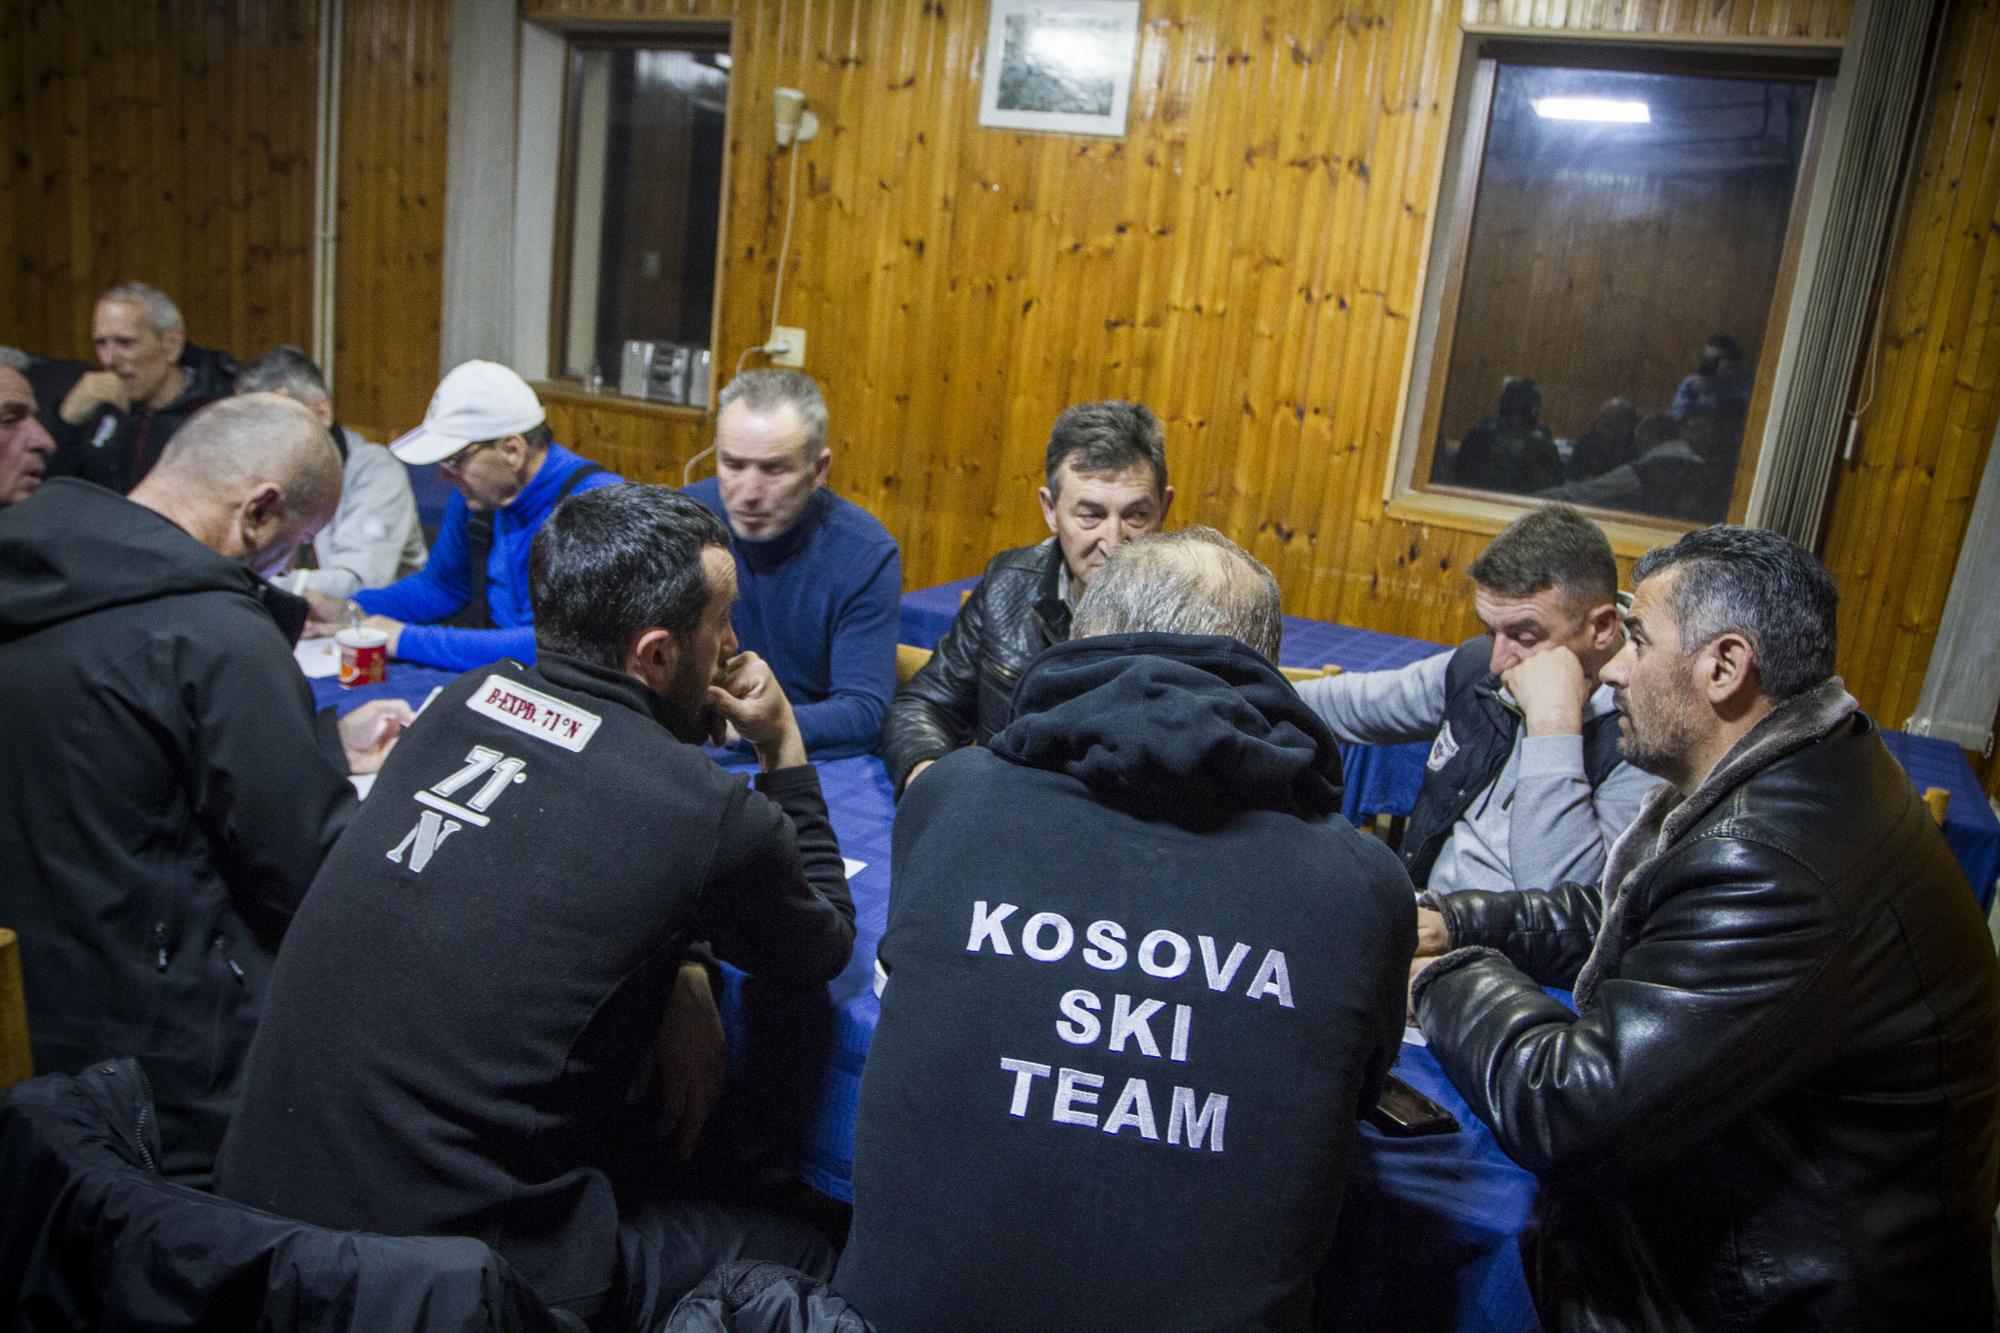 Fisnik DOBRECI Fed Gara Sllallom 087